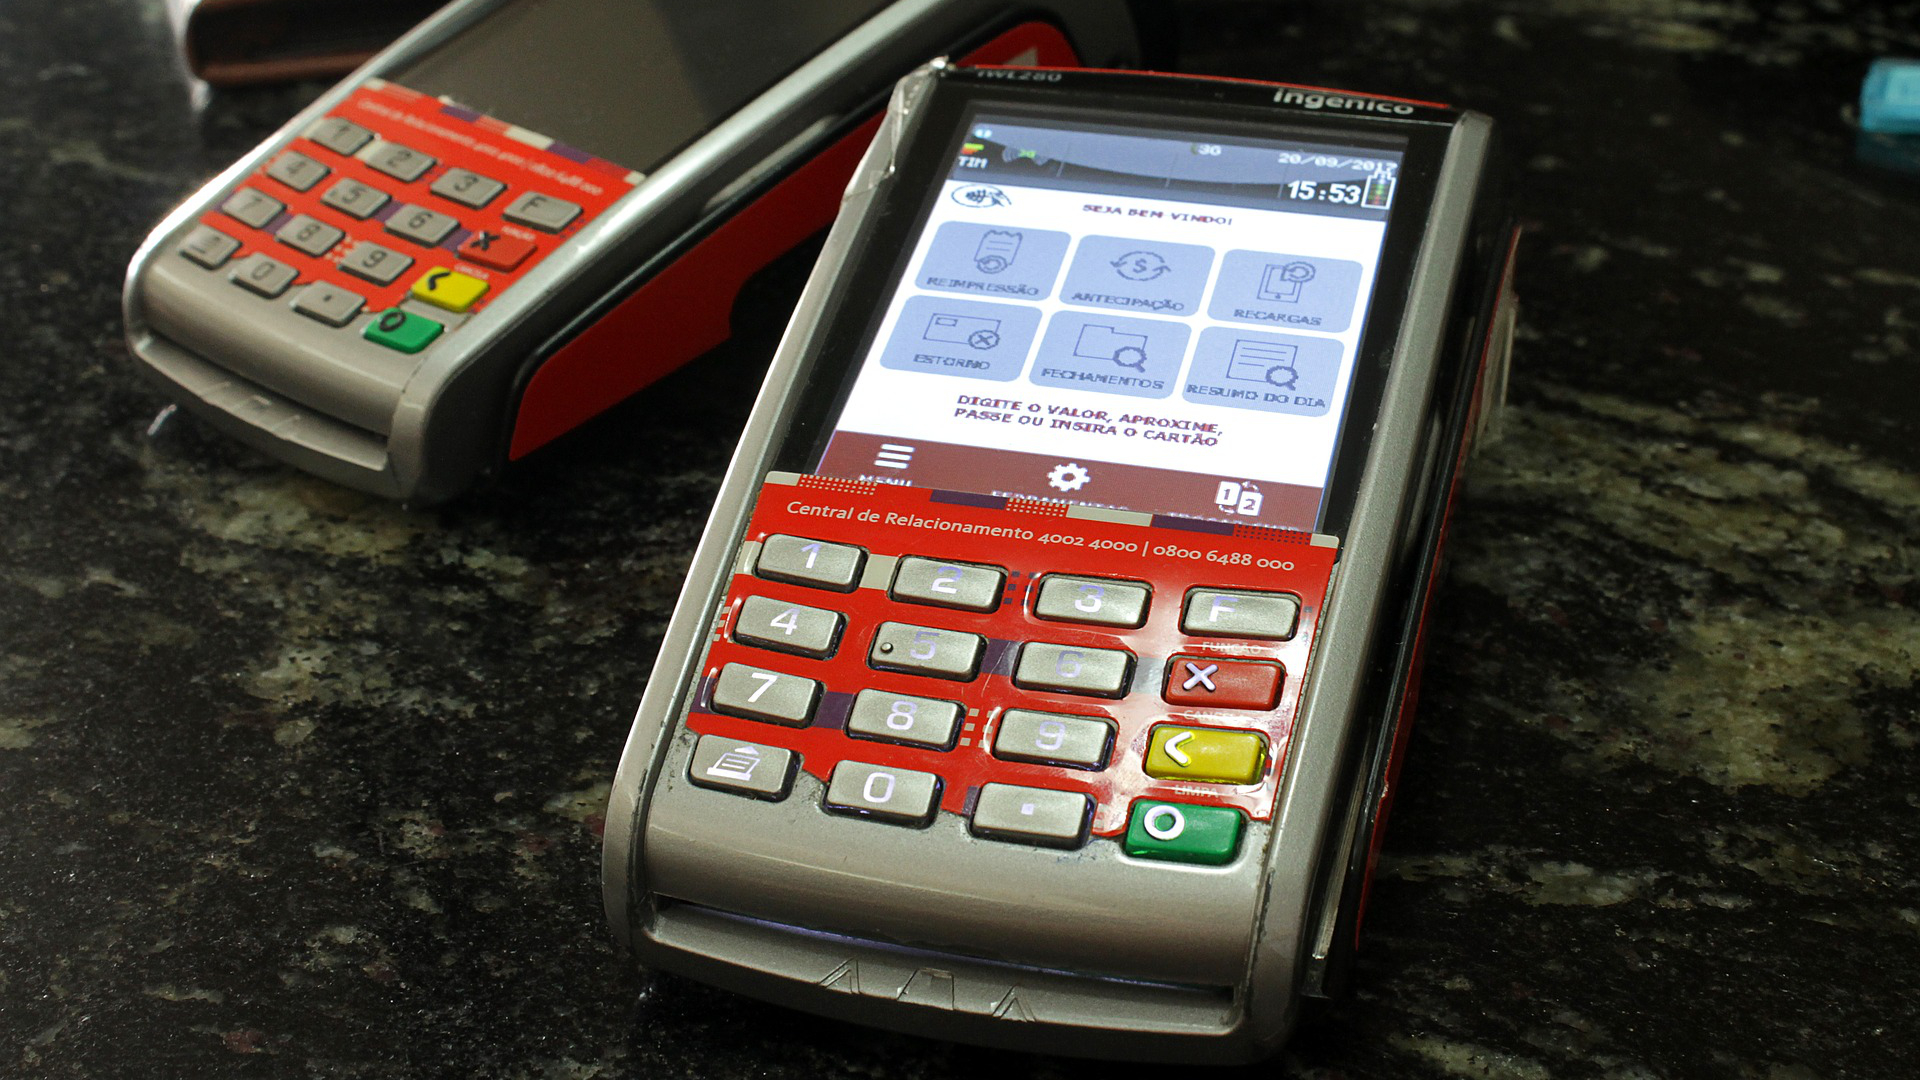 Best mobile card payment reader of 2019 | TechRadar